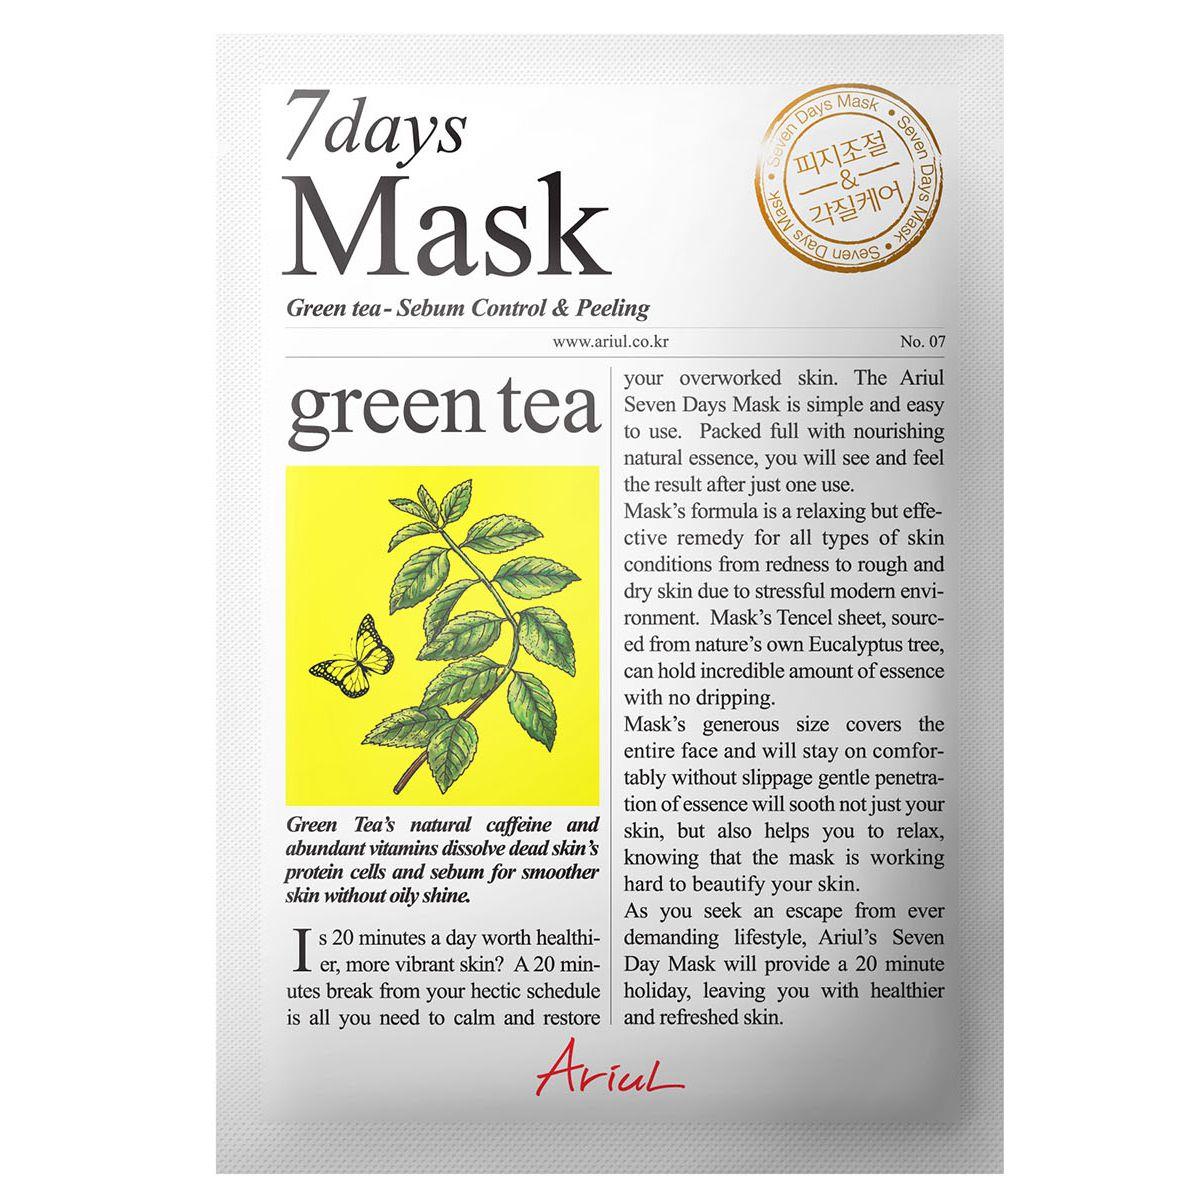 A Green Tea mask sheet in its packaging